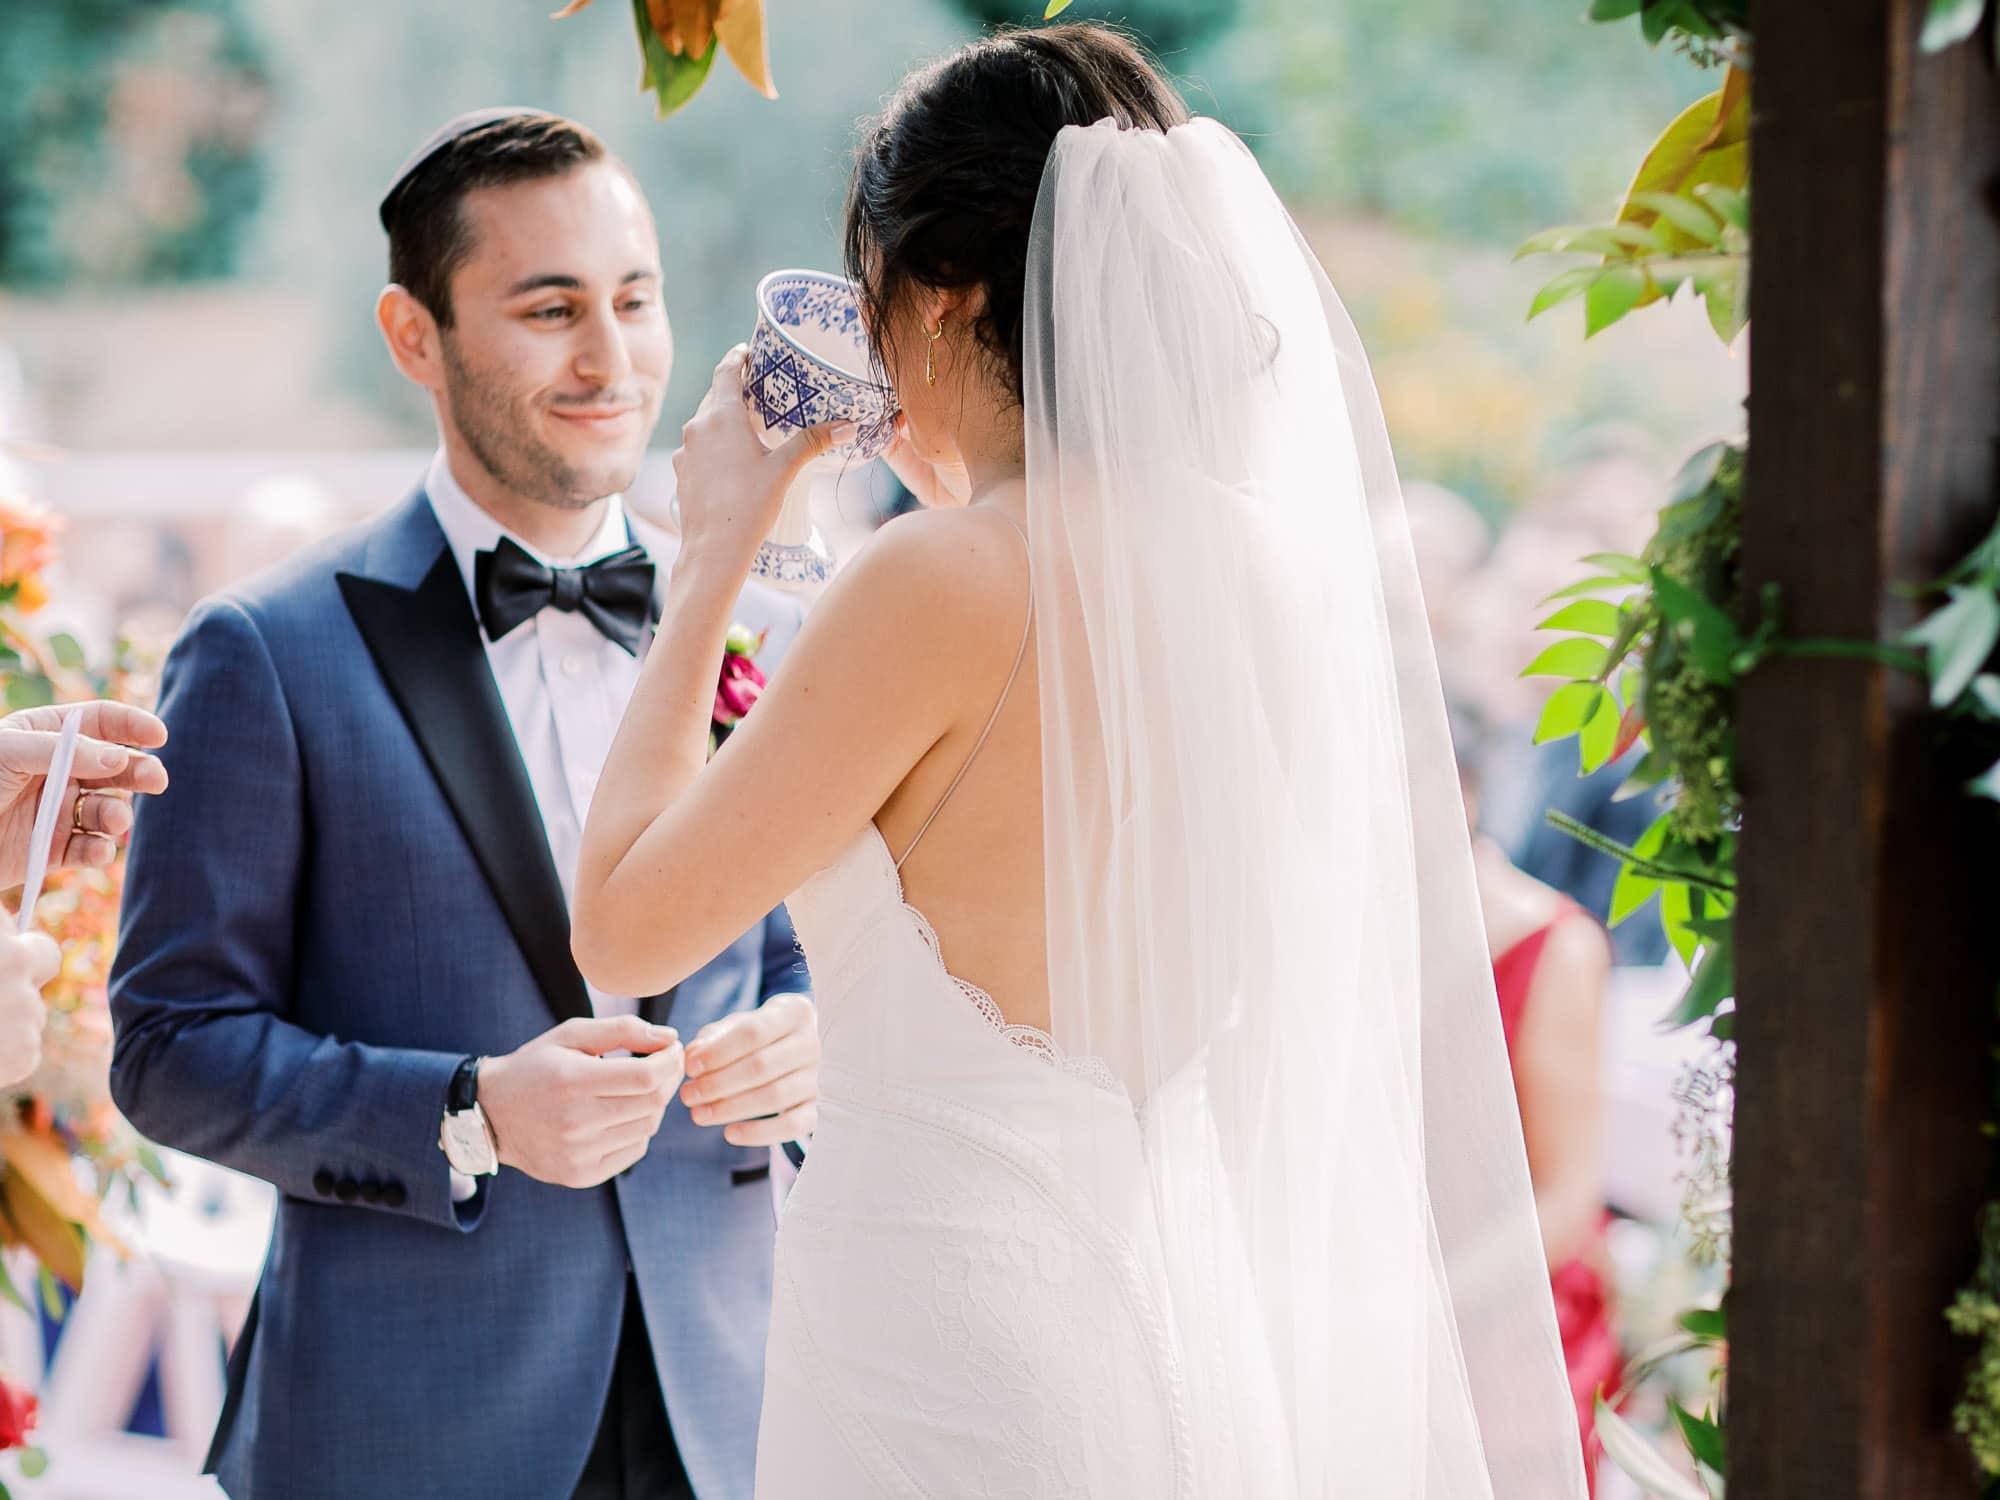 Jewish-Wedding-Ceremony-Greg-Ross